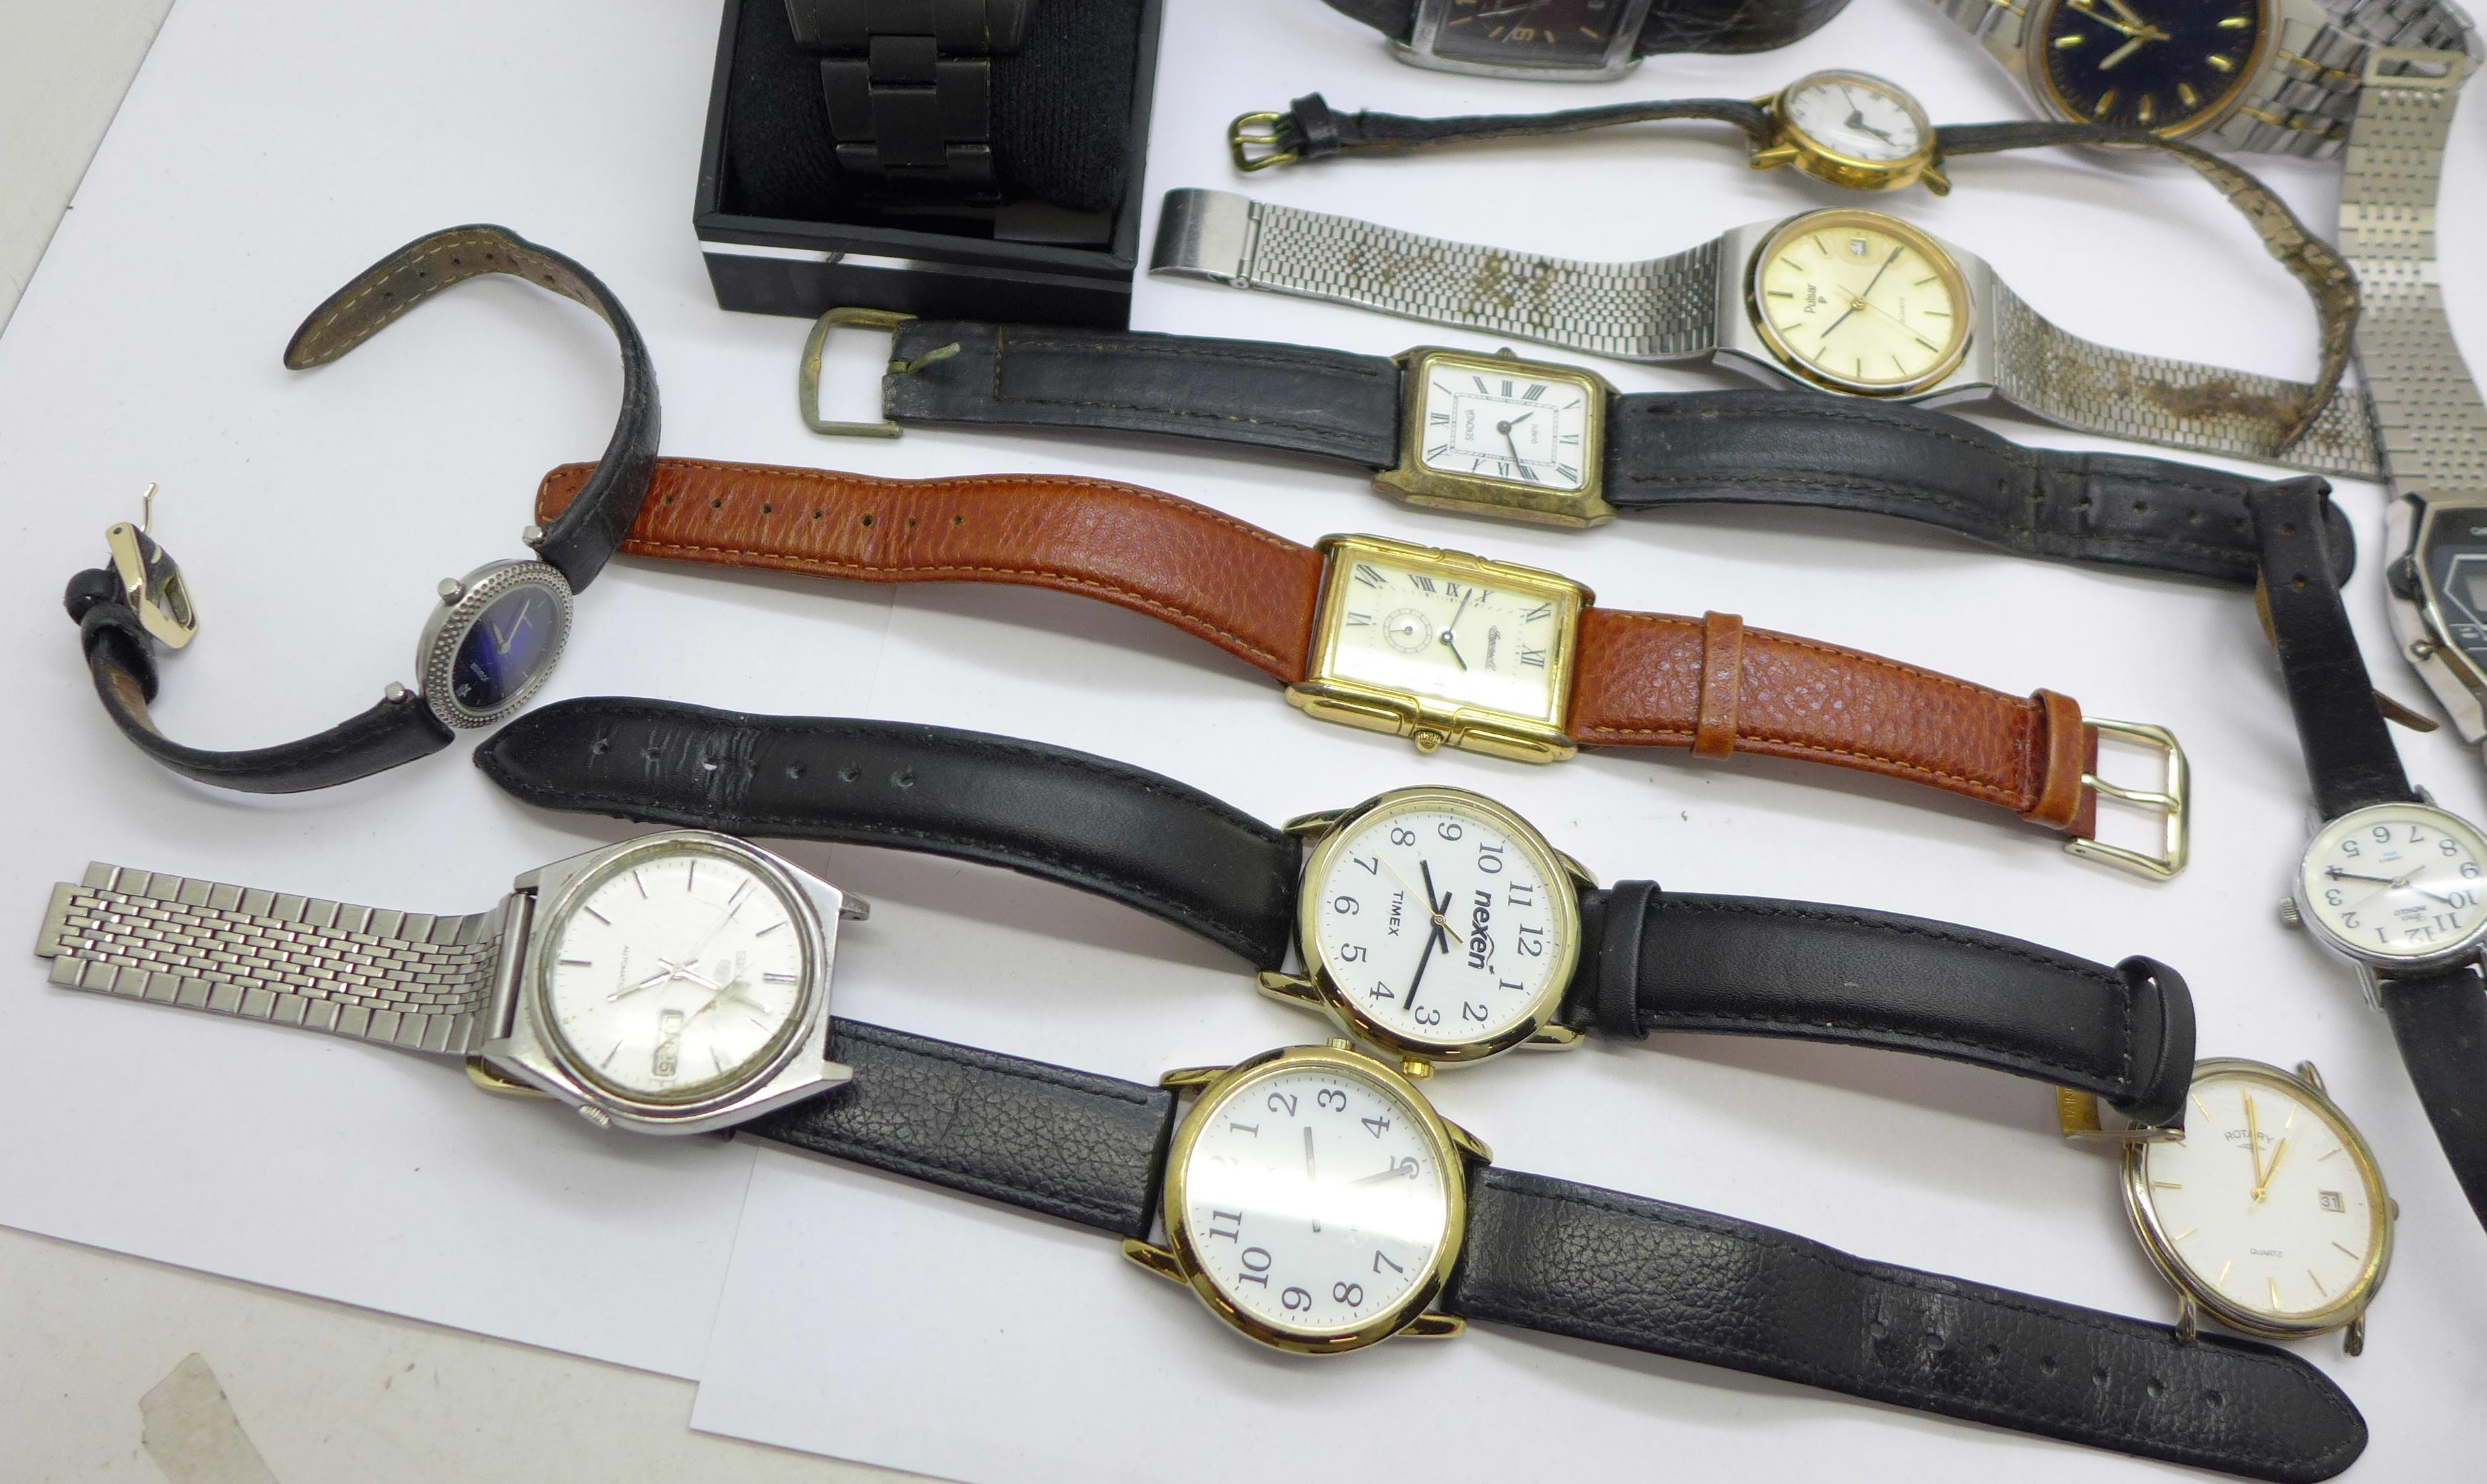 Wristwatches including Sekonda, Seiko, Ingersoll, Rotary, etc. - Image 4 of 5